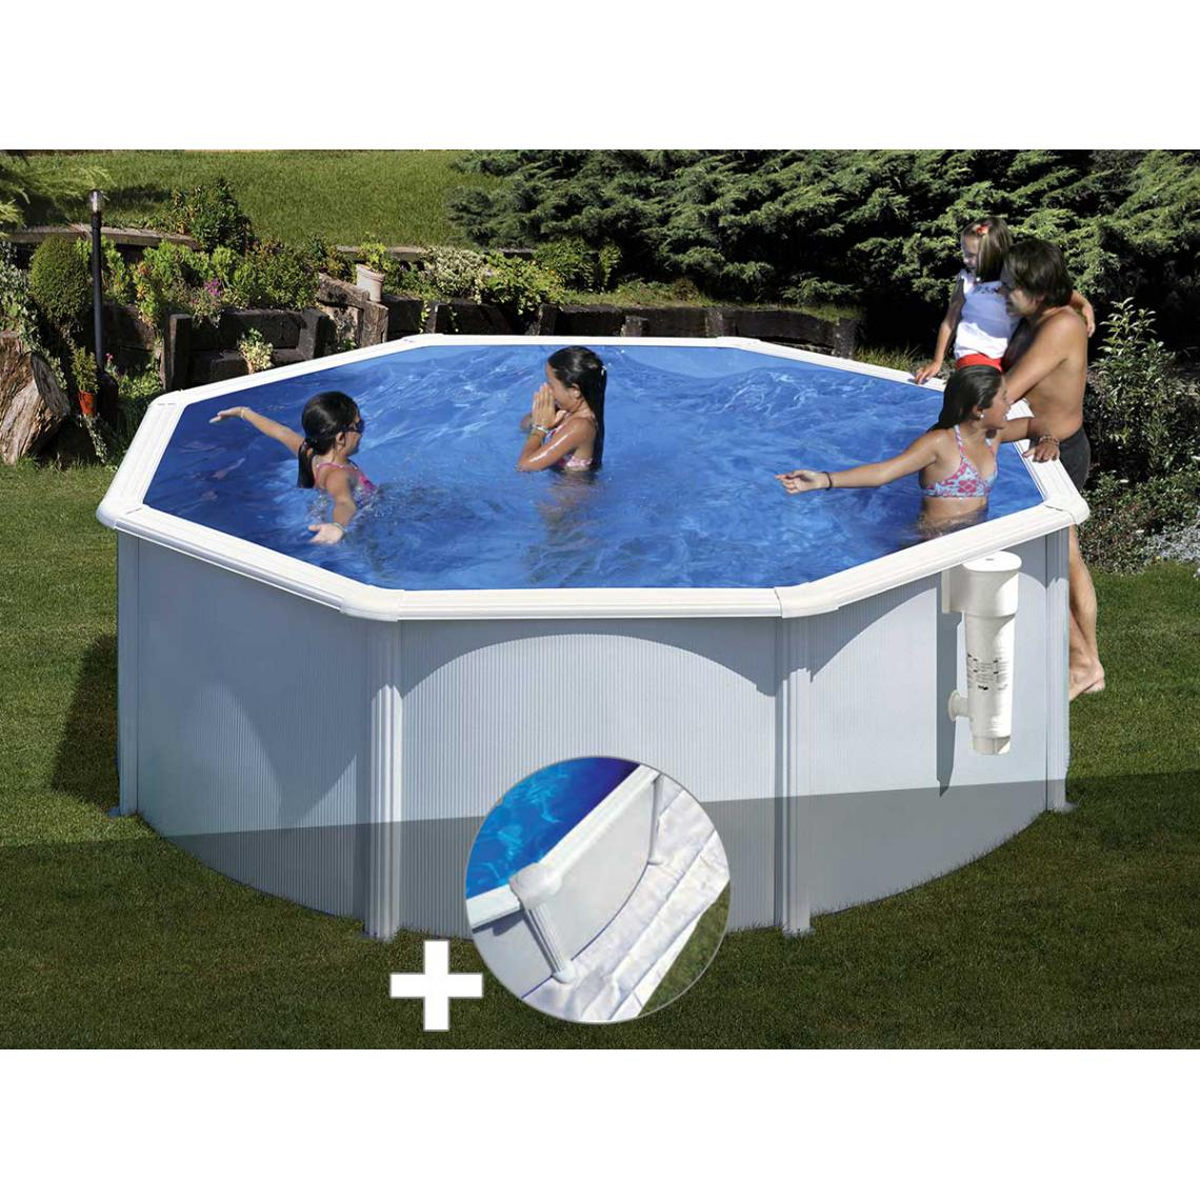 Gre Kit piscine acier blanc Gré Bora Bora ronde 3,20 x 1,22 m + Tapis de sol